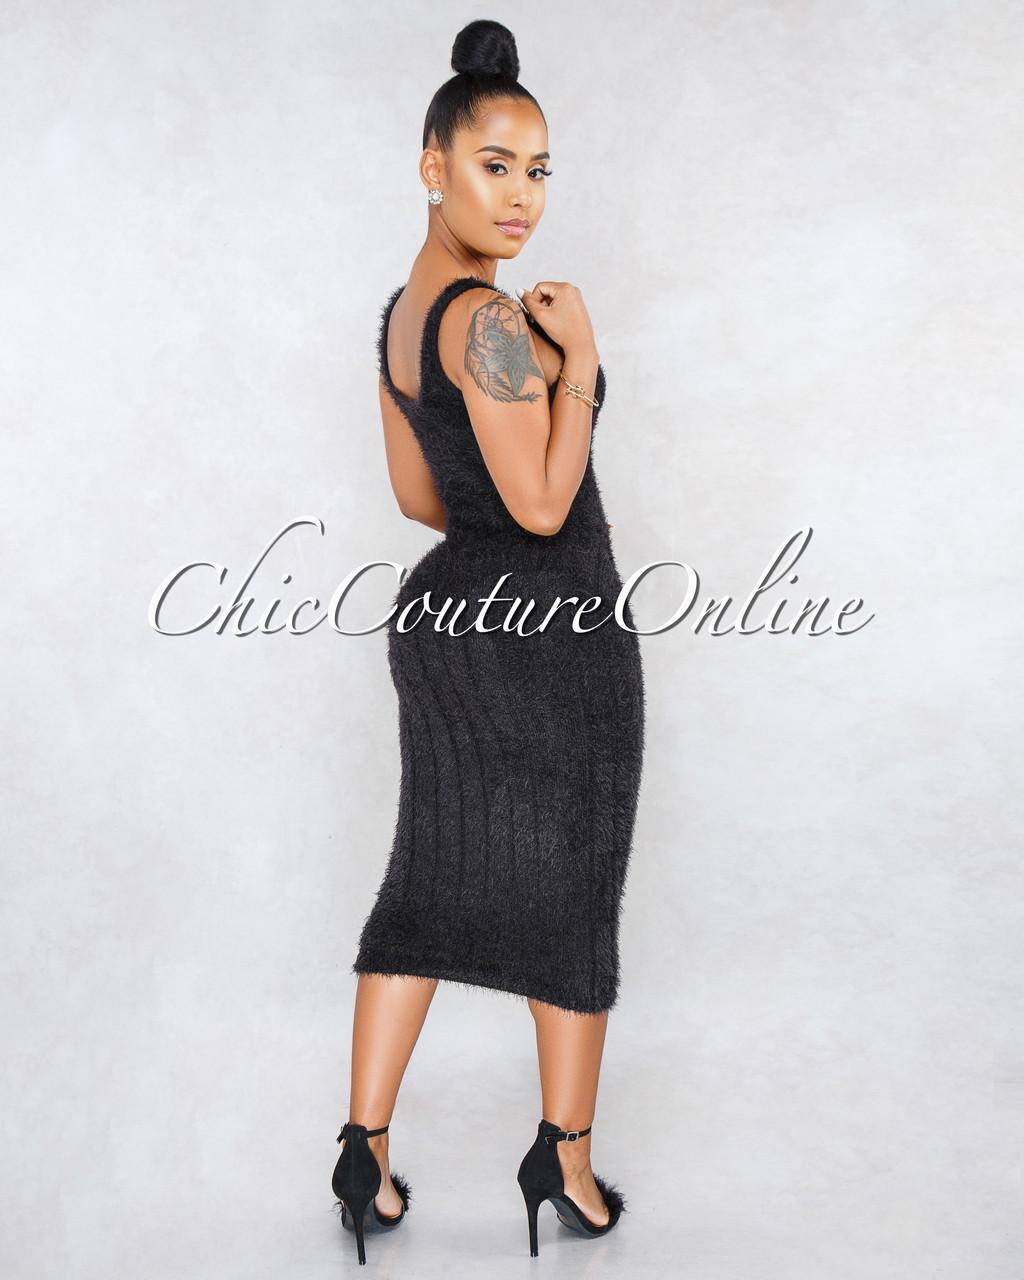 cd816f61526 Adeline Black Ribbed Fuzzy Midi Dress. Price   45.00. Image 1. Larger    More Photos